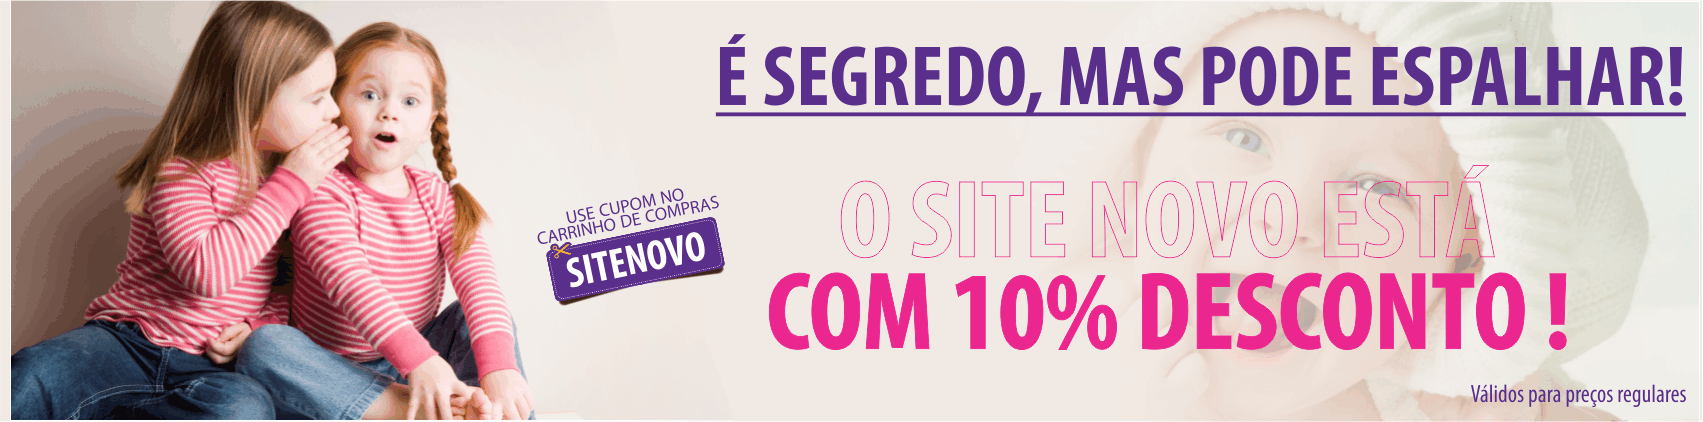 data/banners/promocoes/promocao-loja-bebe-gd.png